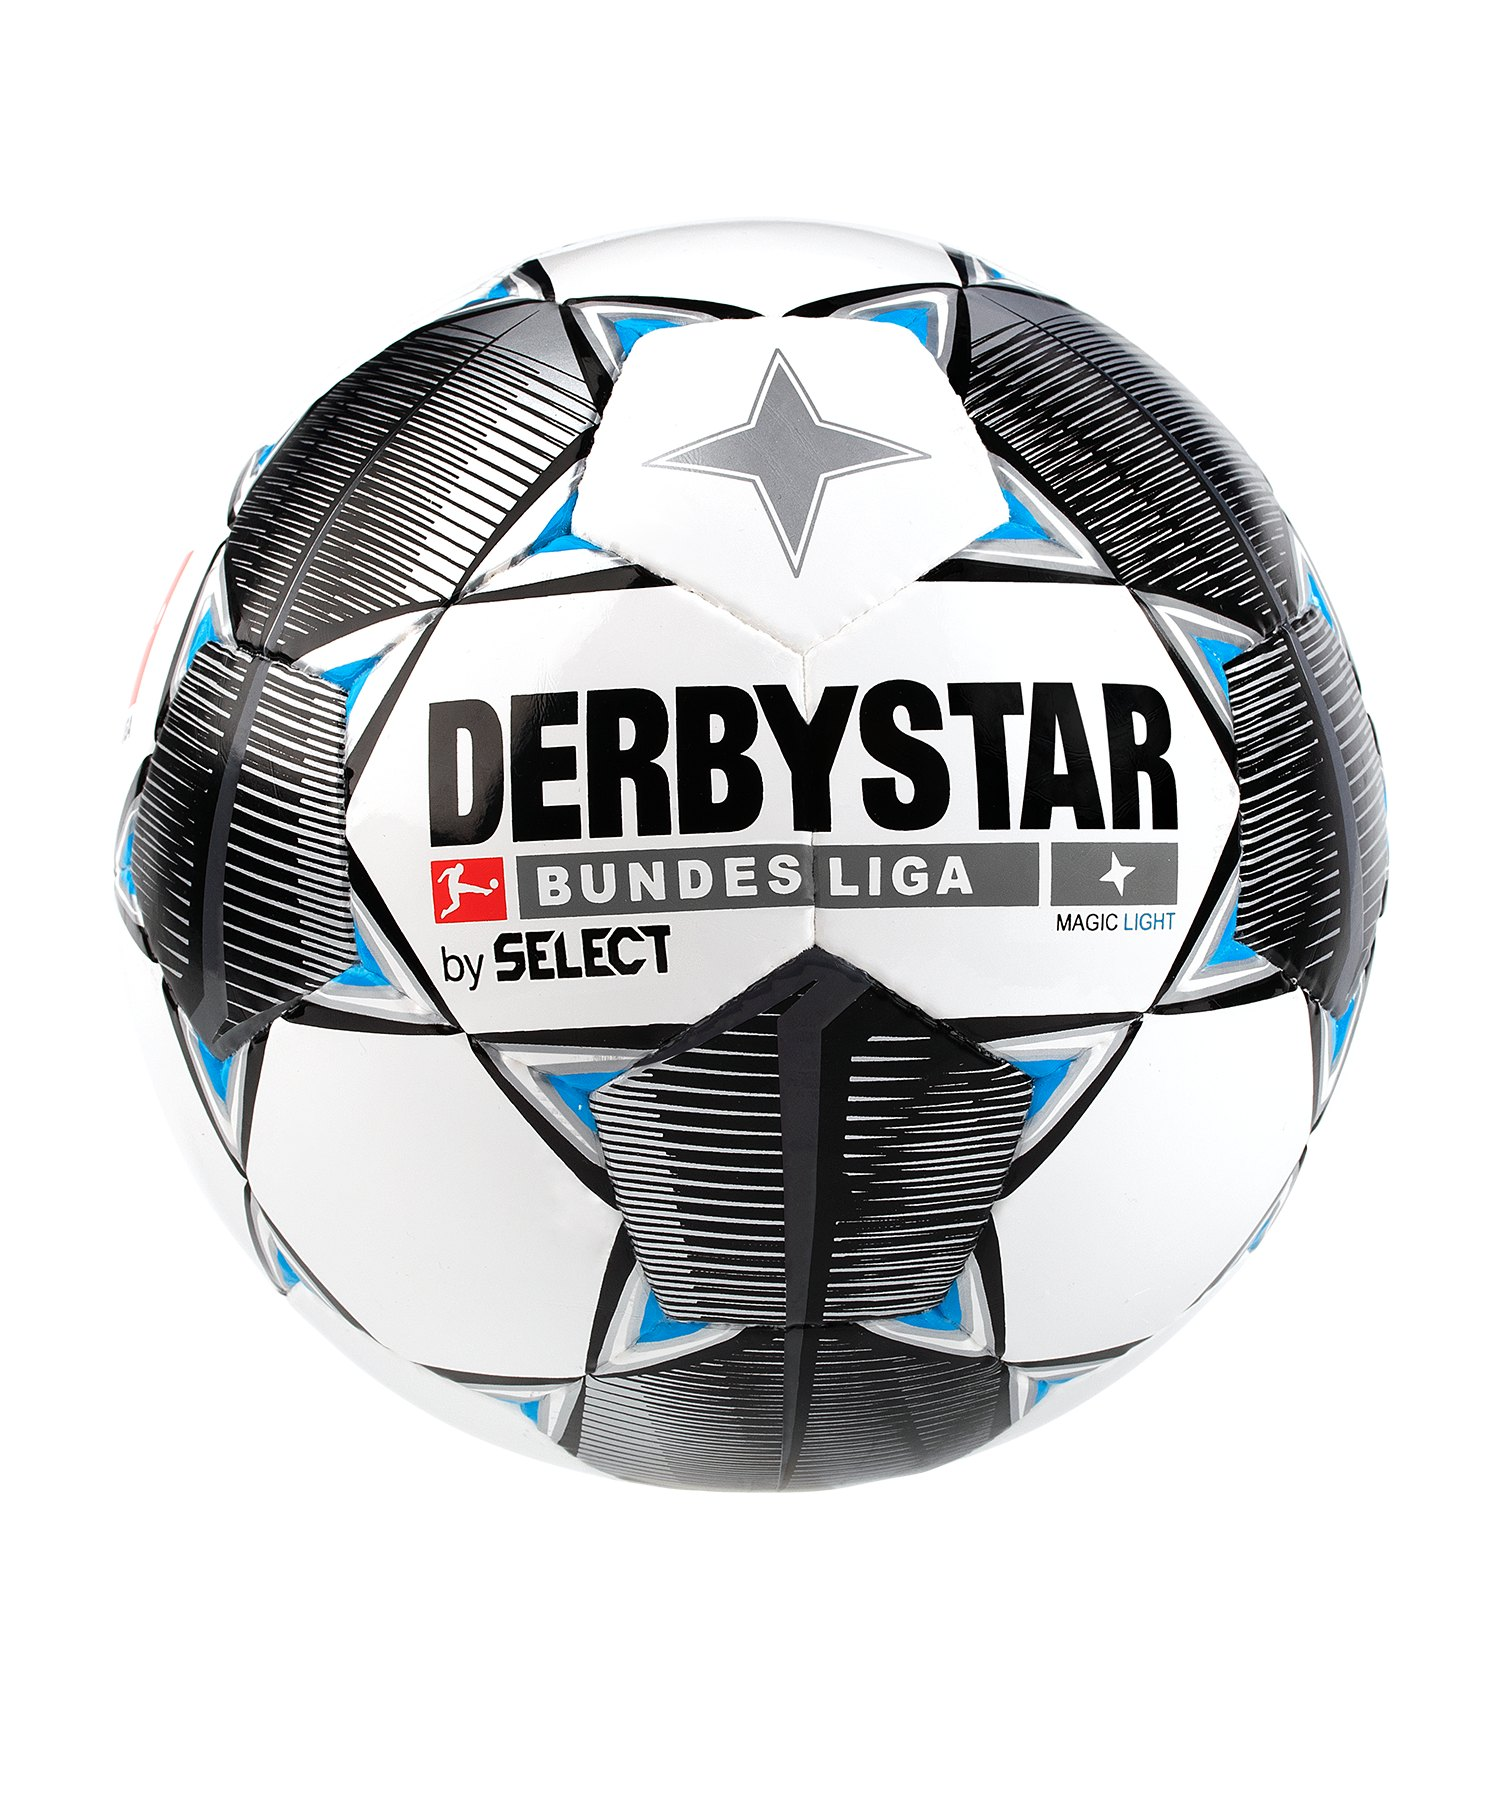 Derbystar Bundesliga Magic Light 350 Gramm Weiss F019 - weiss